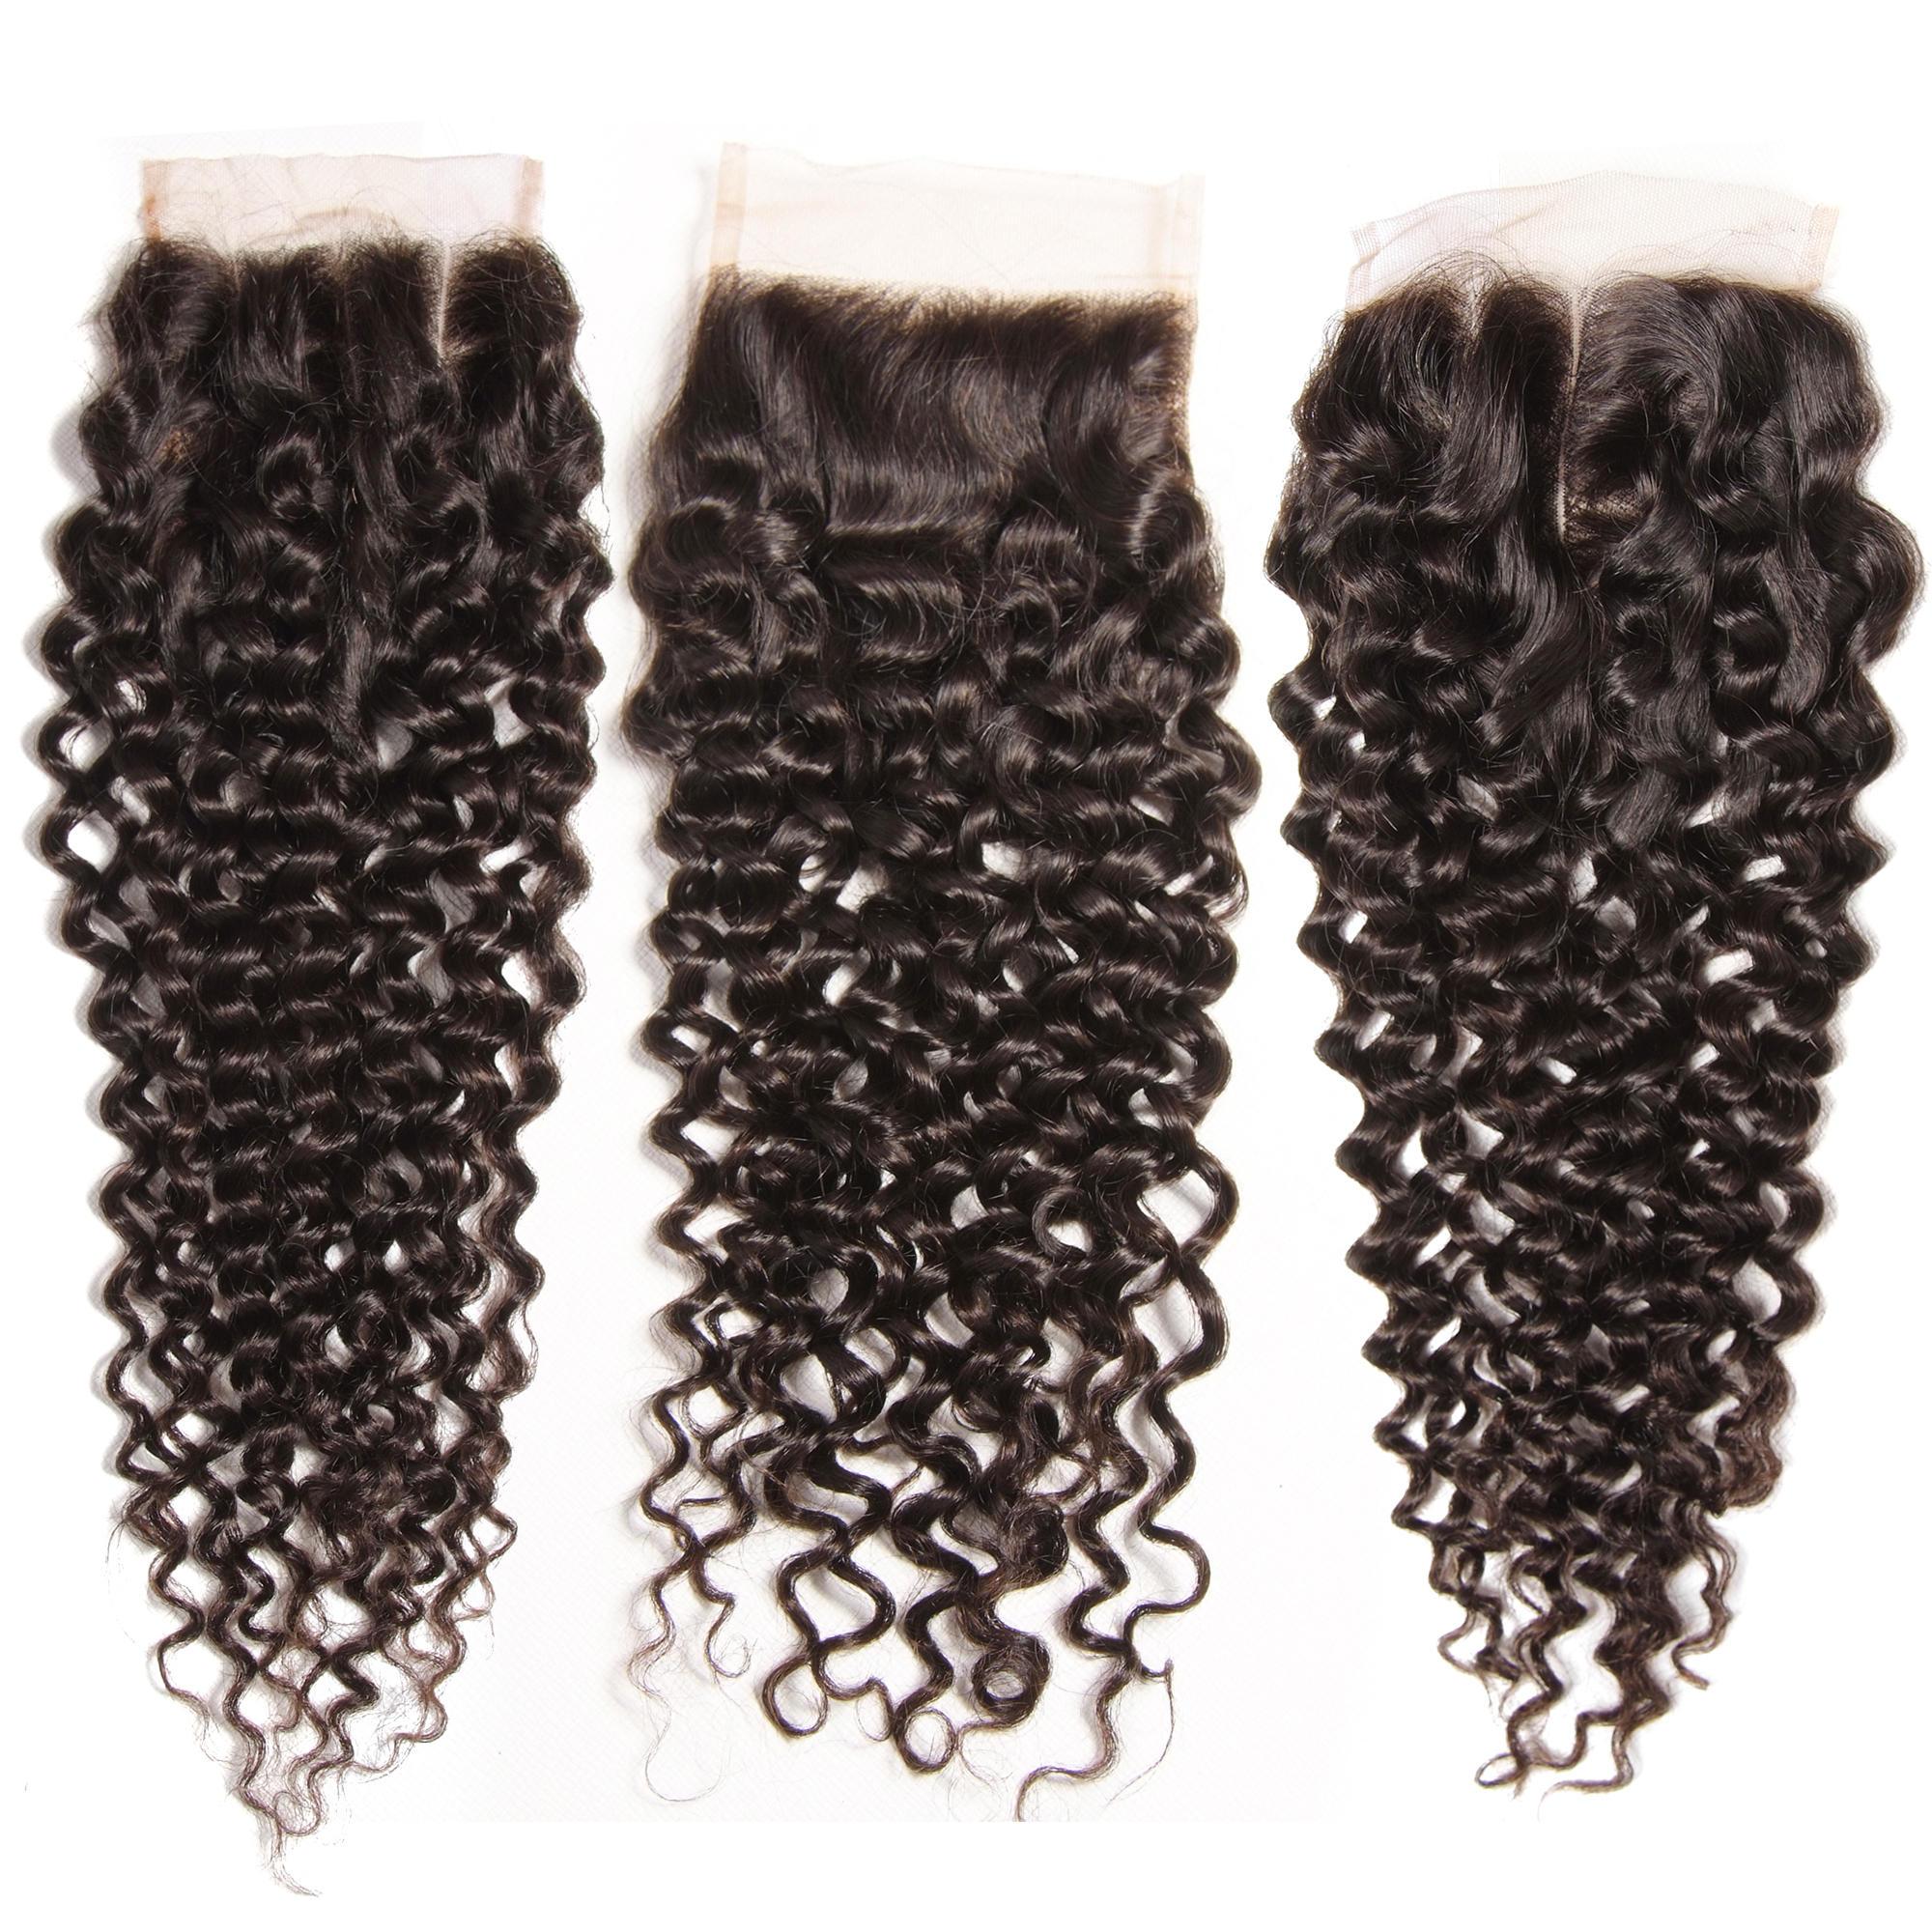 UNice Hair image 34